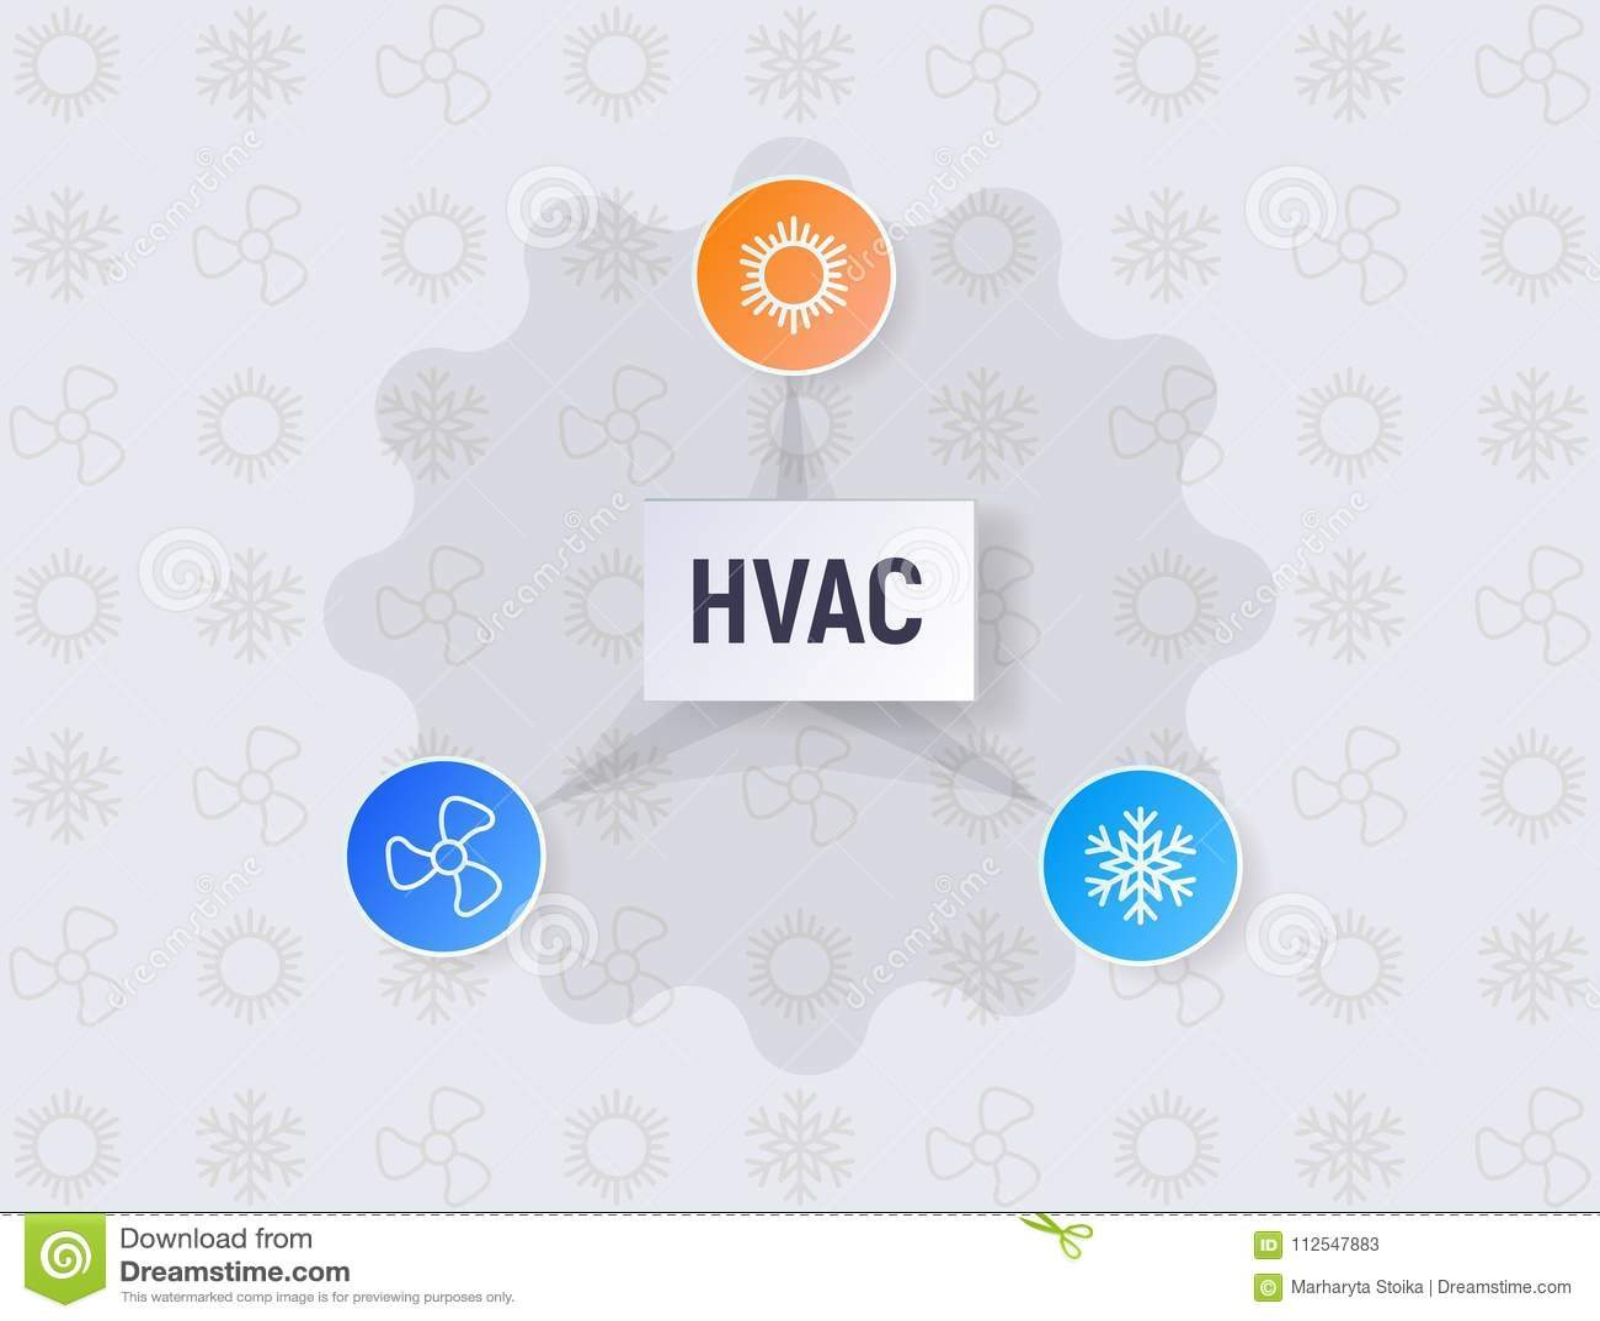 Hvac Infographics Stock Vector Illustration Of Sign 112547883